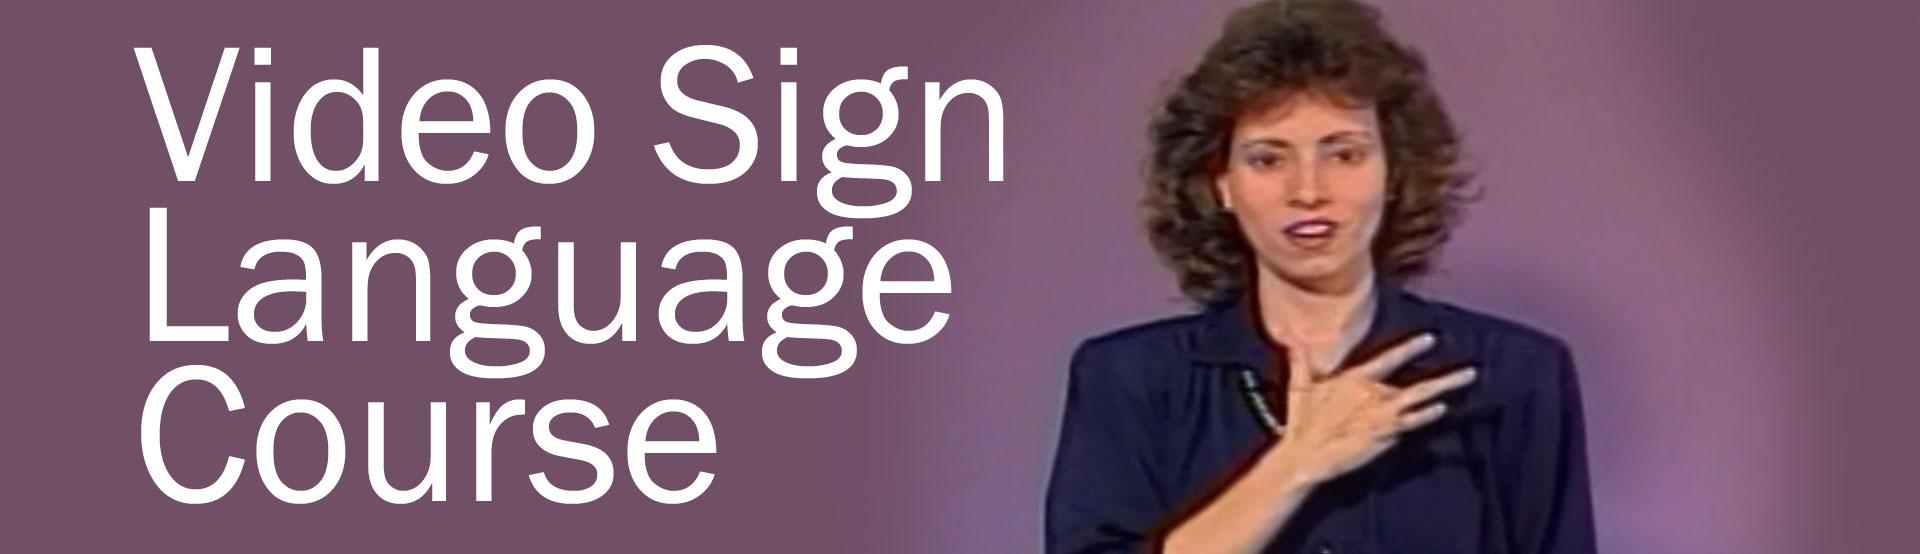 Video Sign Language Course